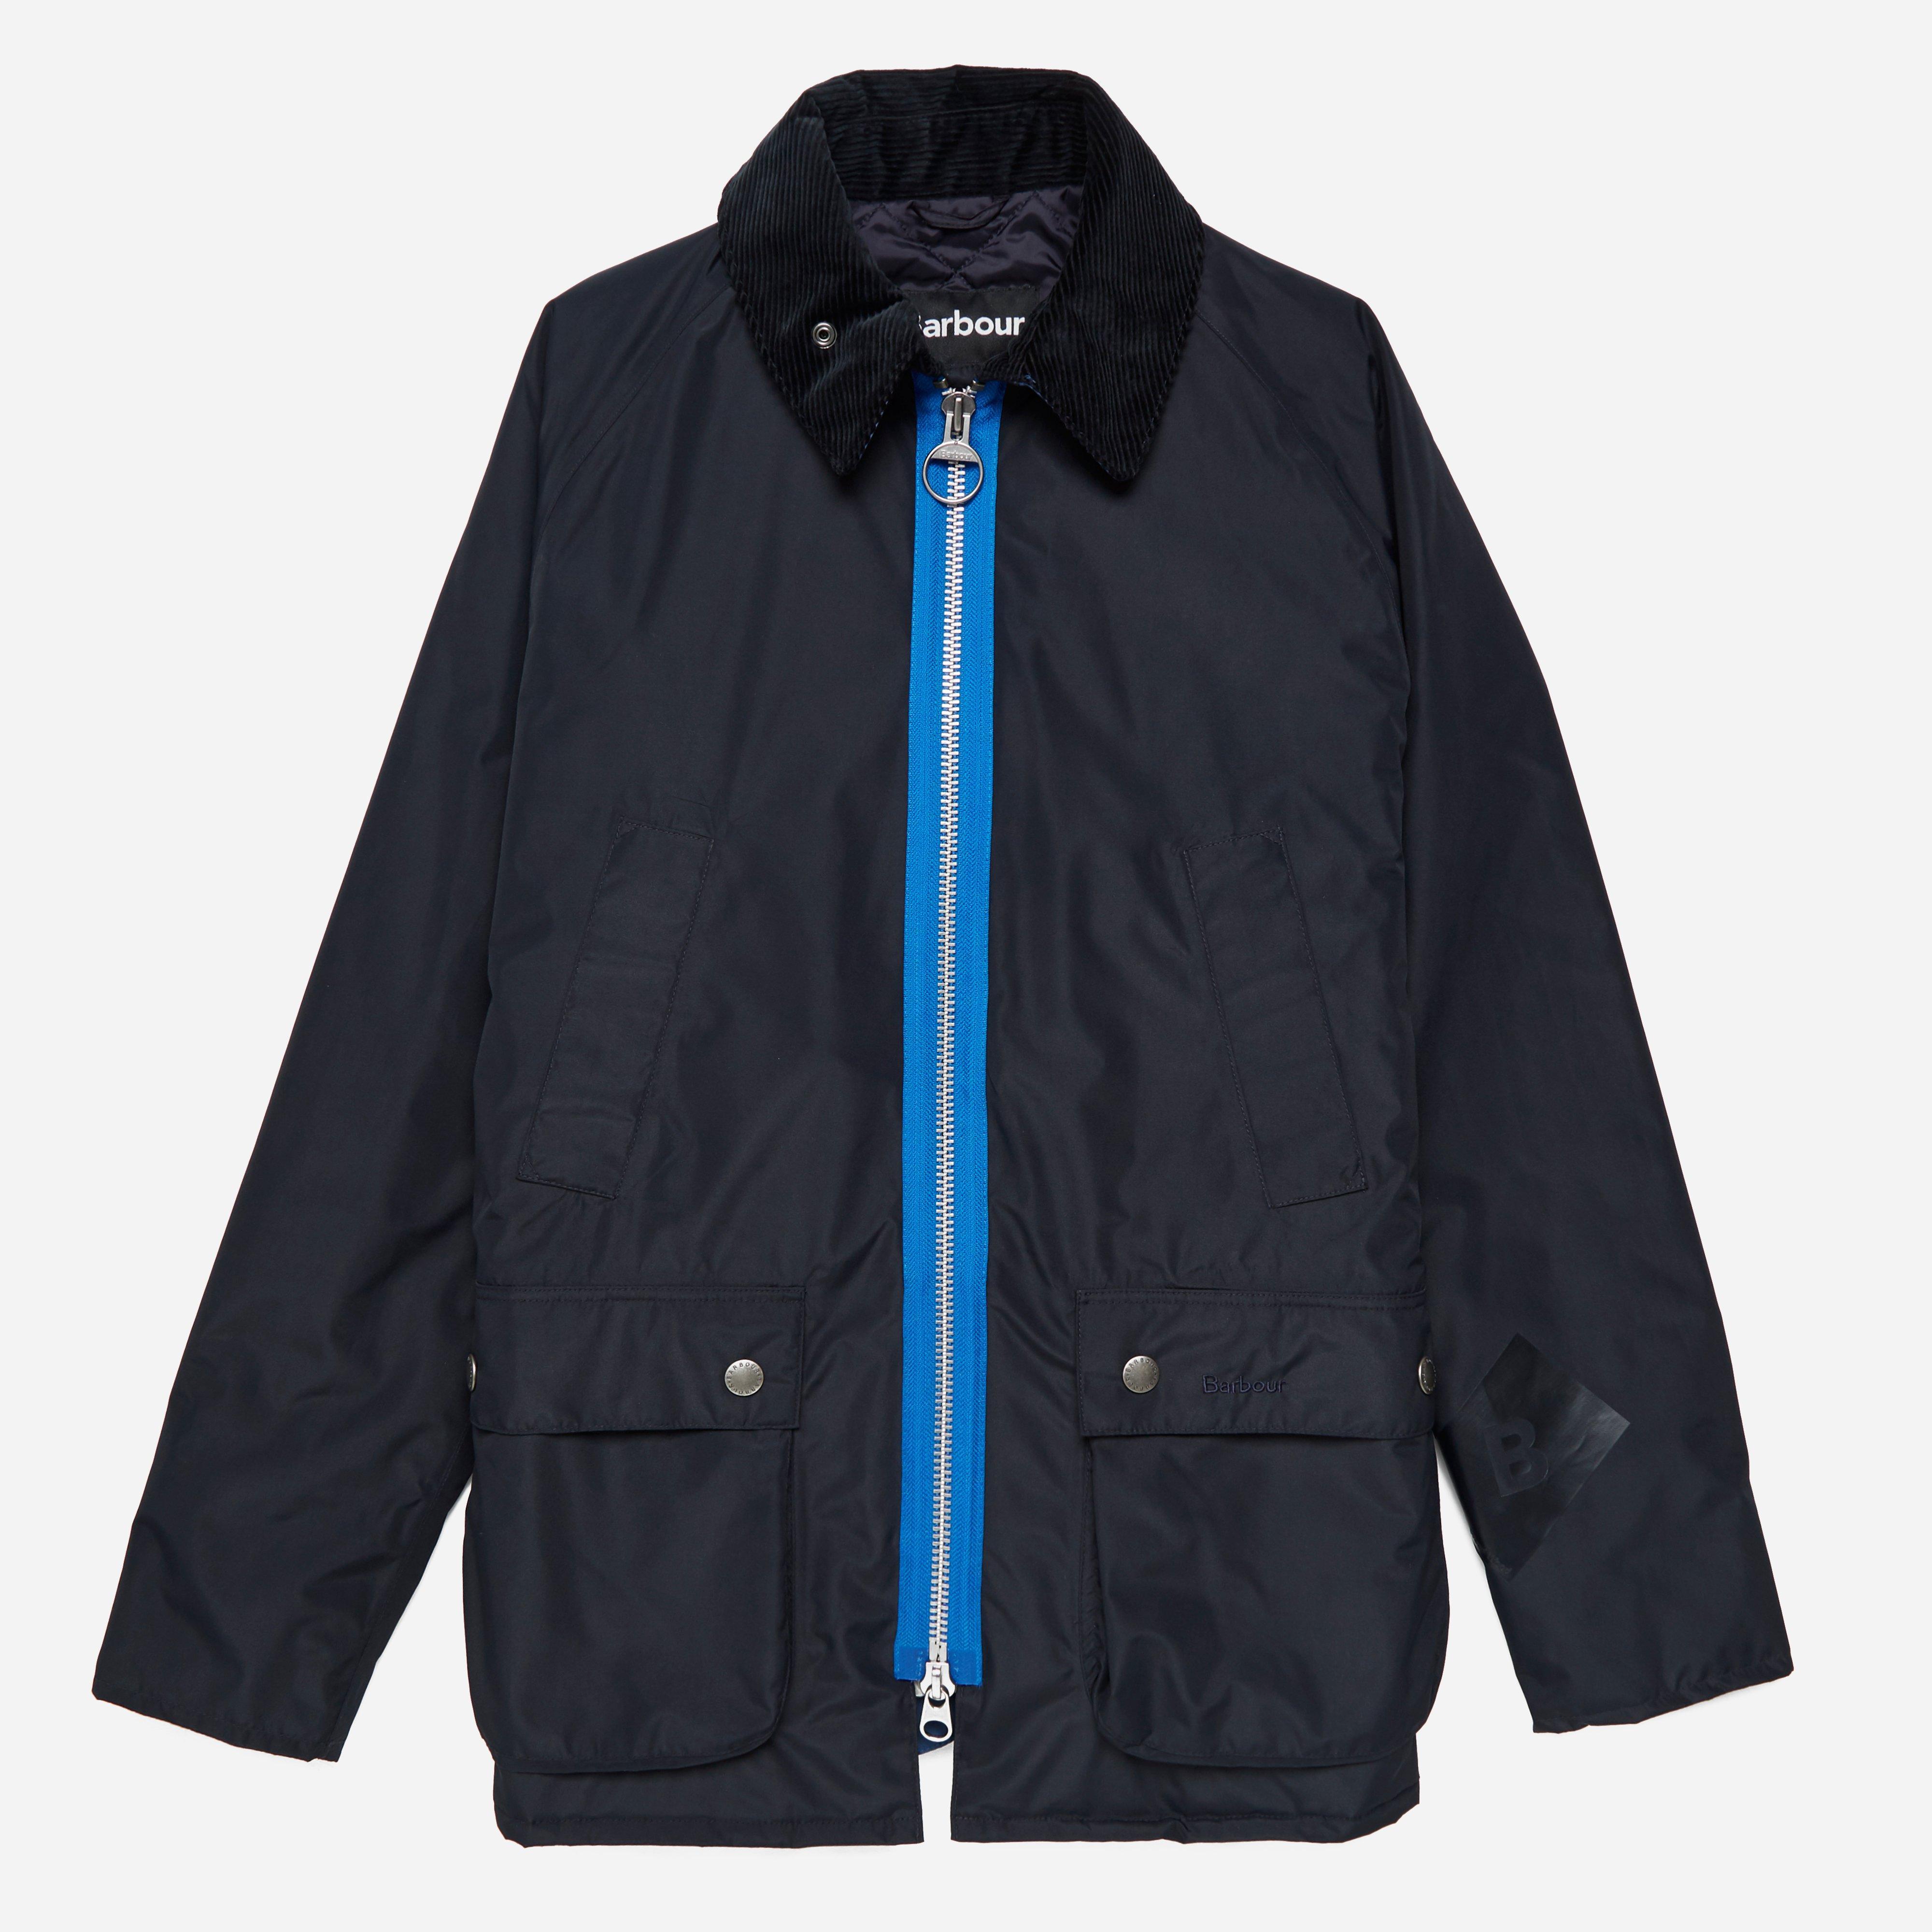 Barbour X Wood Wood Kilde Jacket